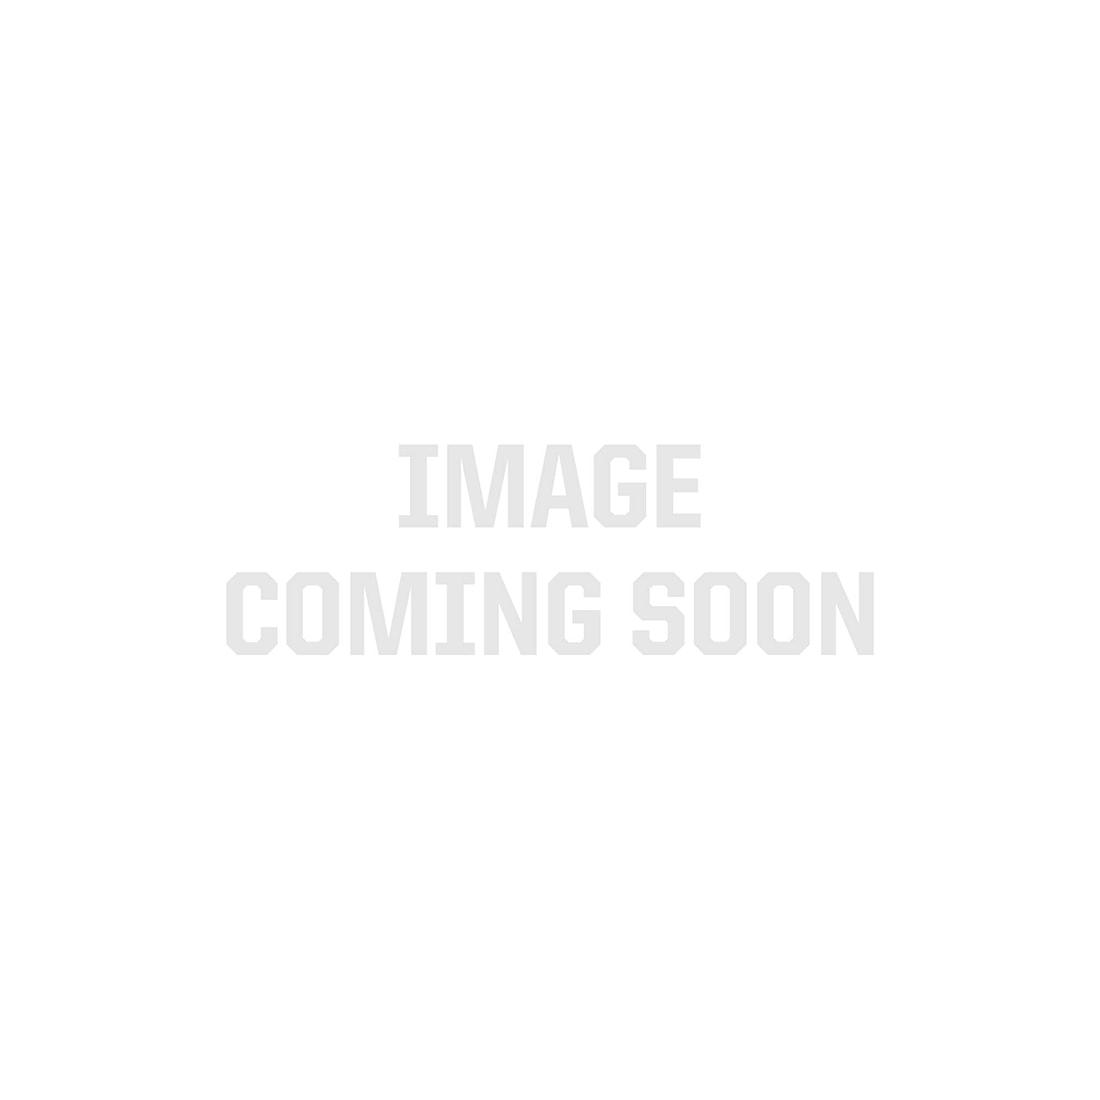 LumenMax 2835 LED Strip Light - 6,500K - 240/m - CurrentControl - Sample Kit